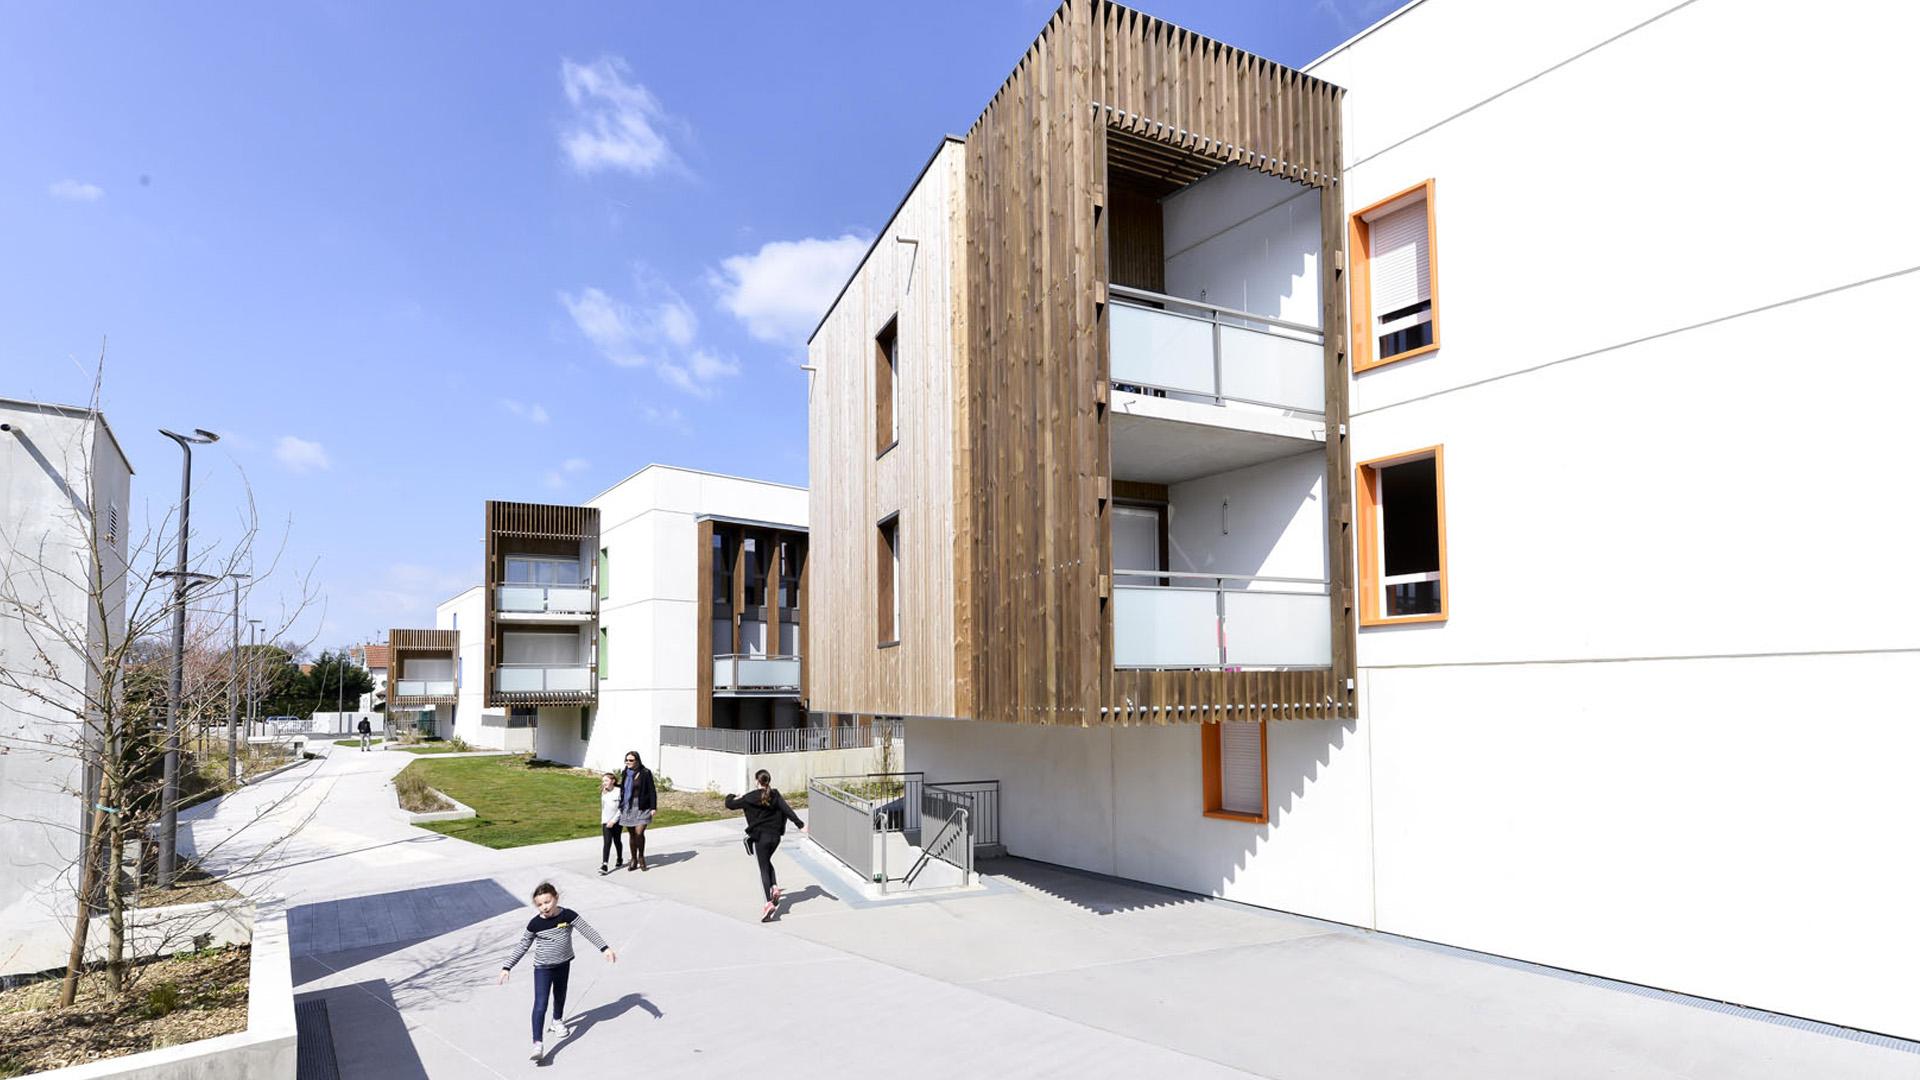 Seuil-architecture-Canavera-ICF-photo-S.Brugidou-01